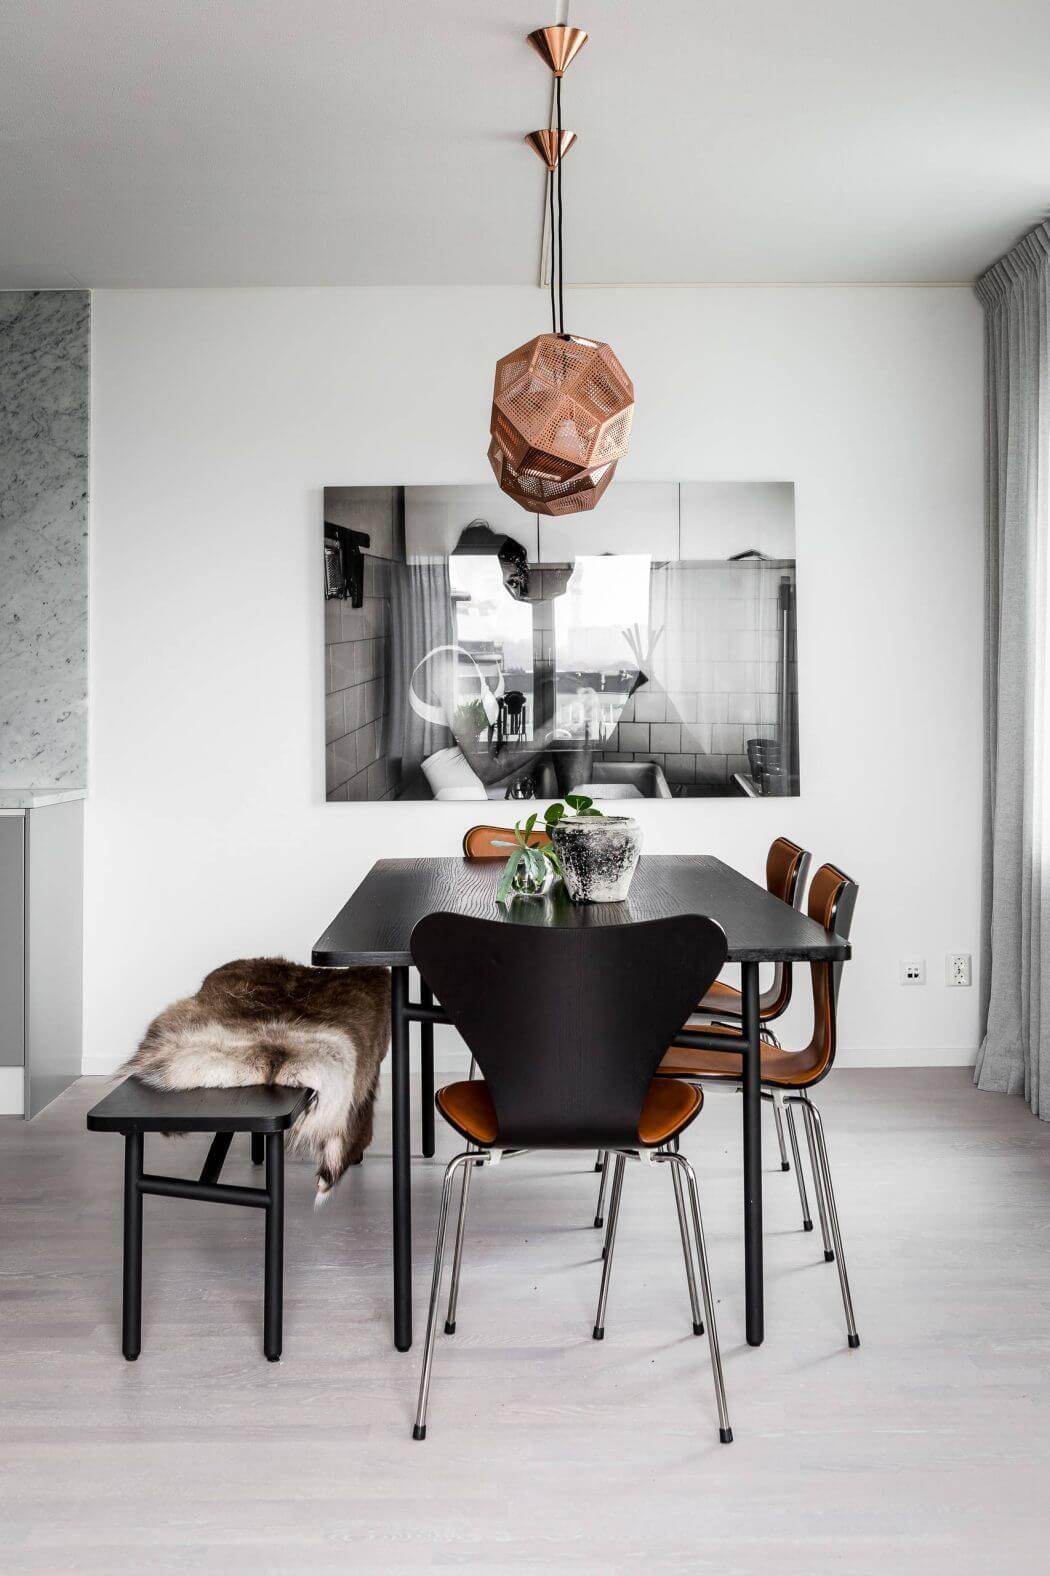 nordic salon liljeholmstorget